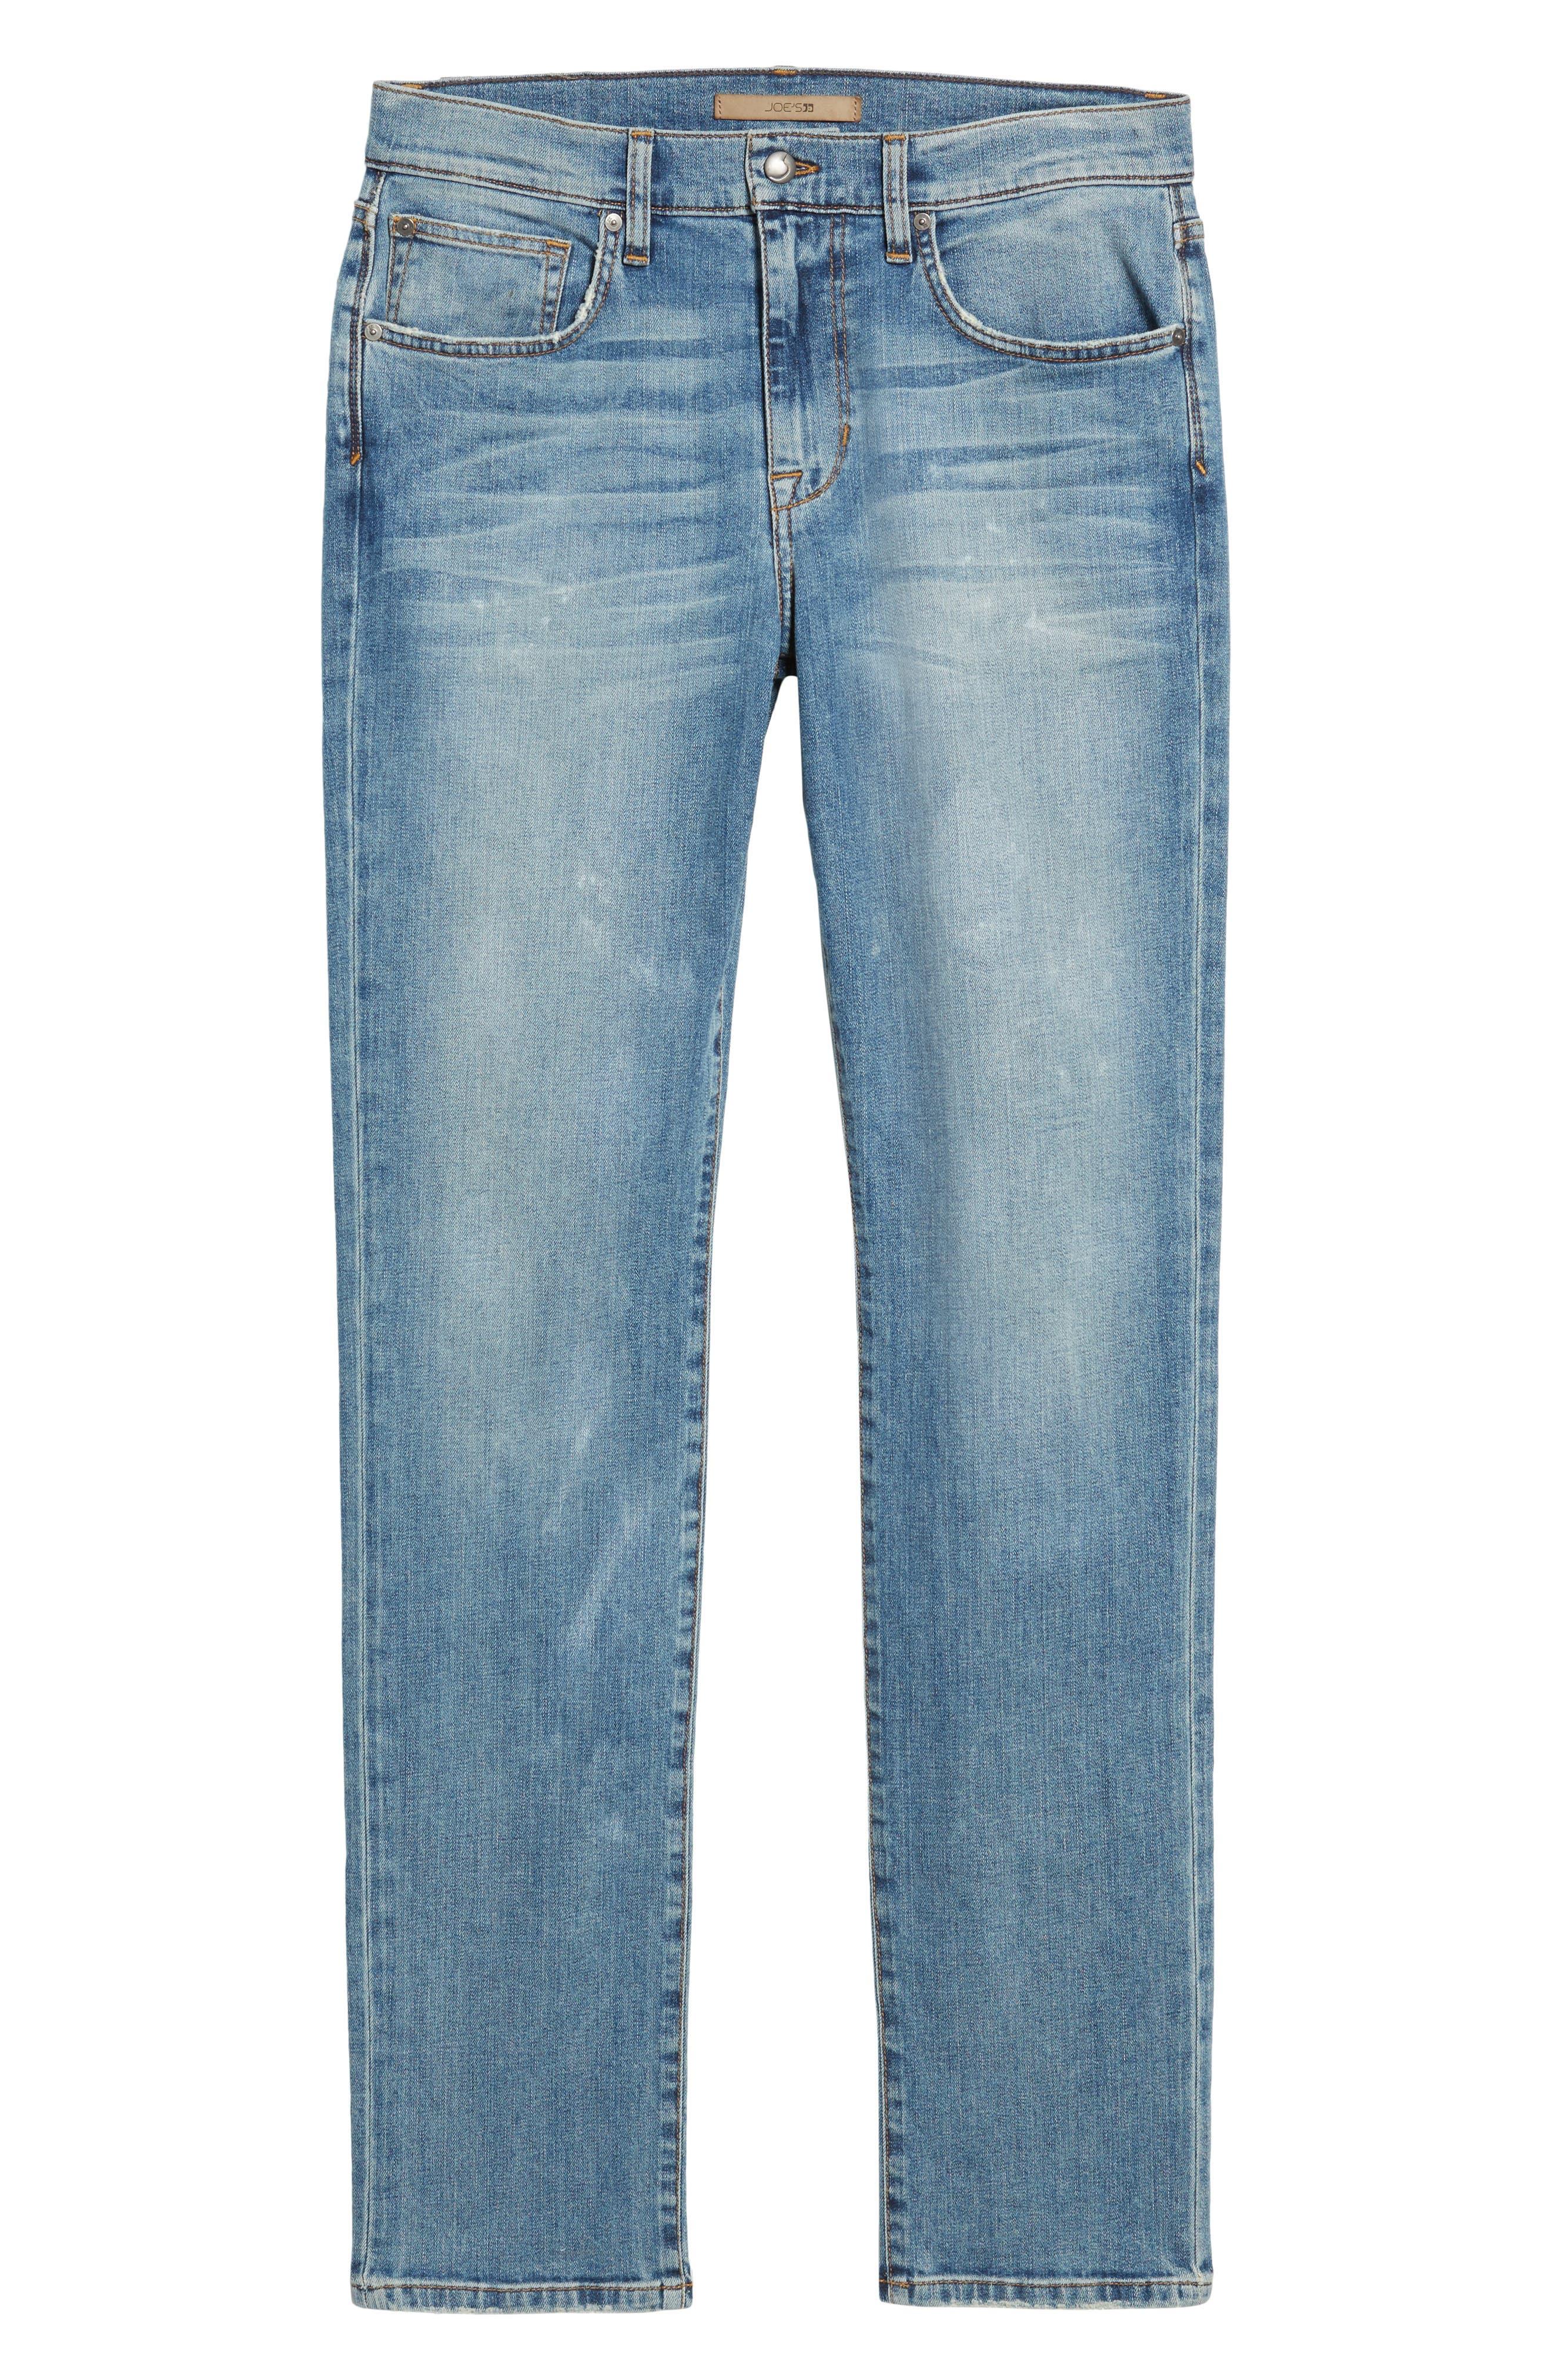 Brixton Slim Straight Fit Jeans,                             Alternate thumbnail 6, color,                             Wyman